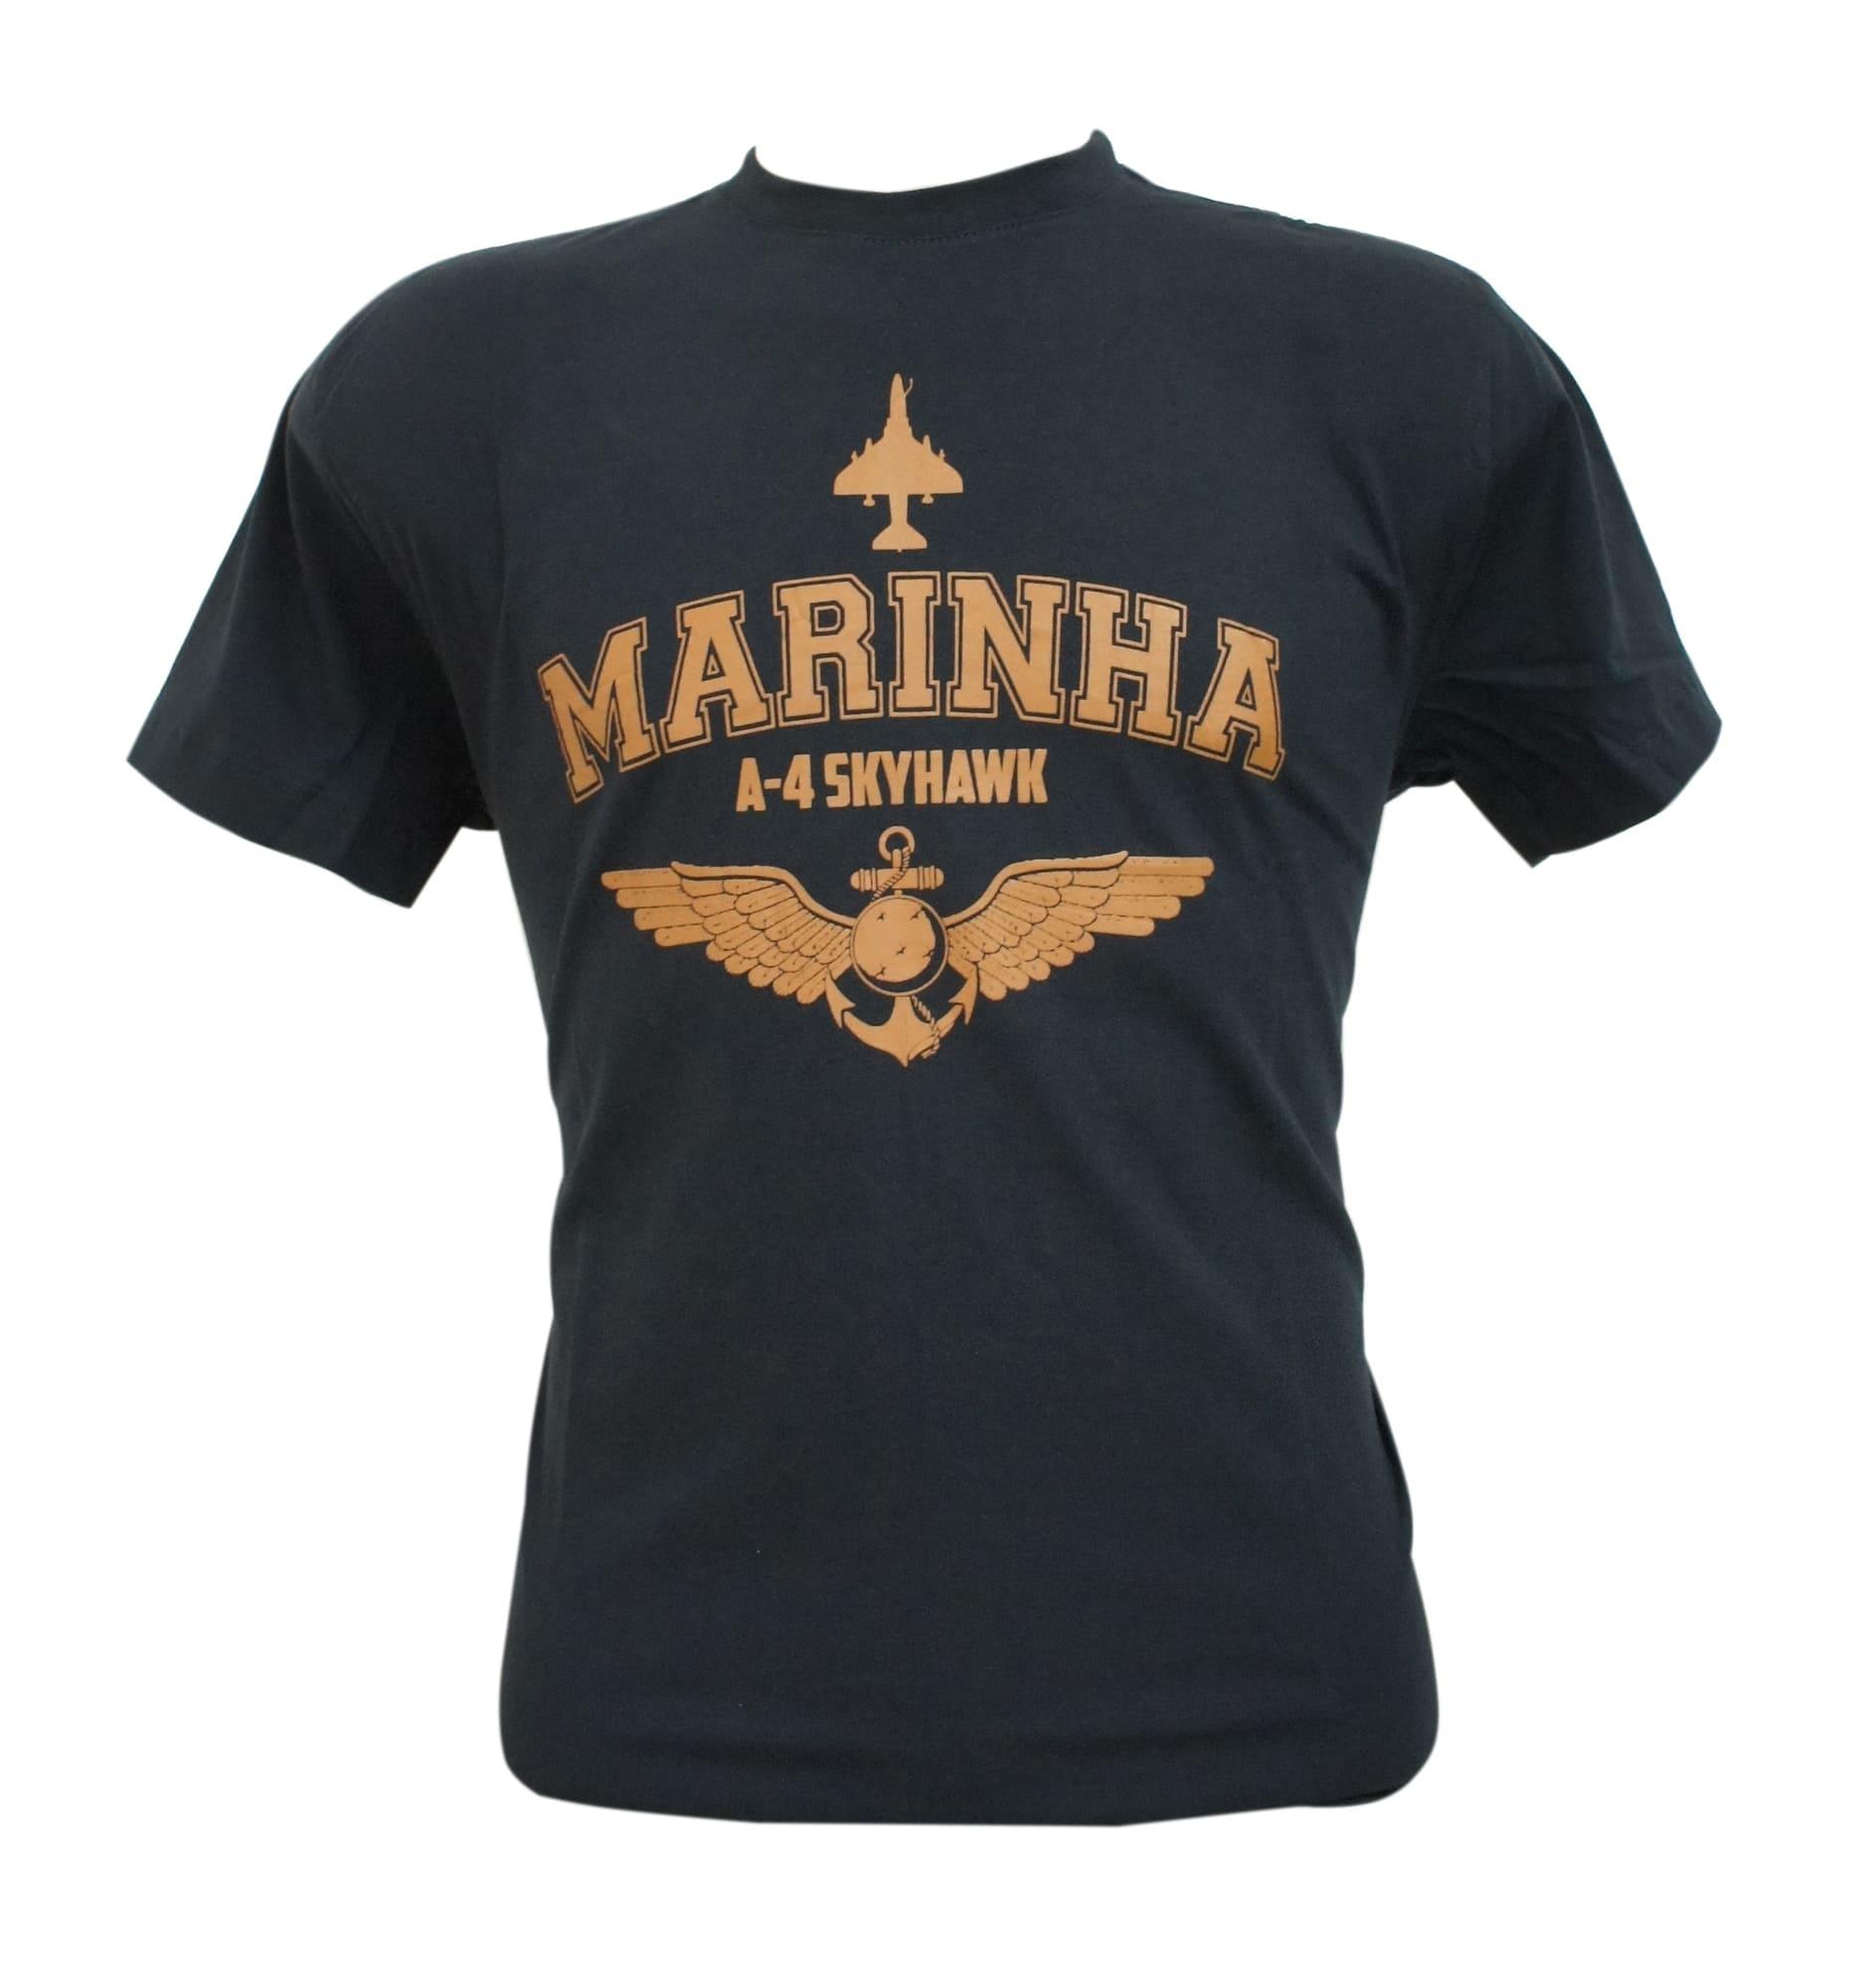 Camiseta Marinha Skyhawk